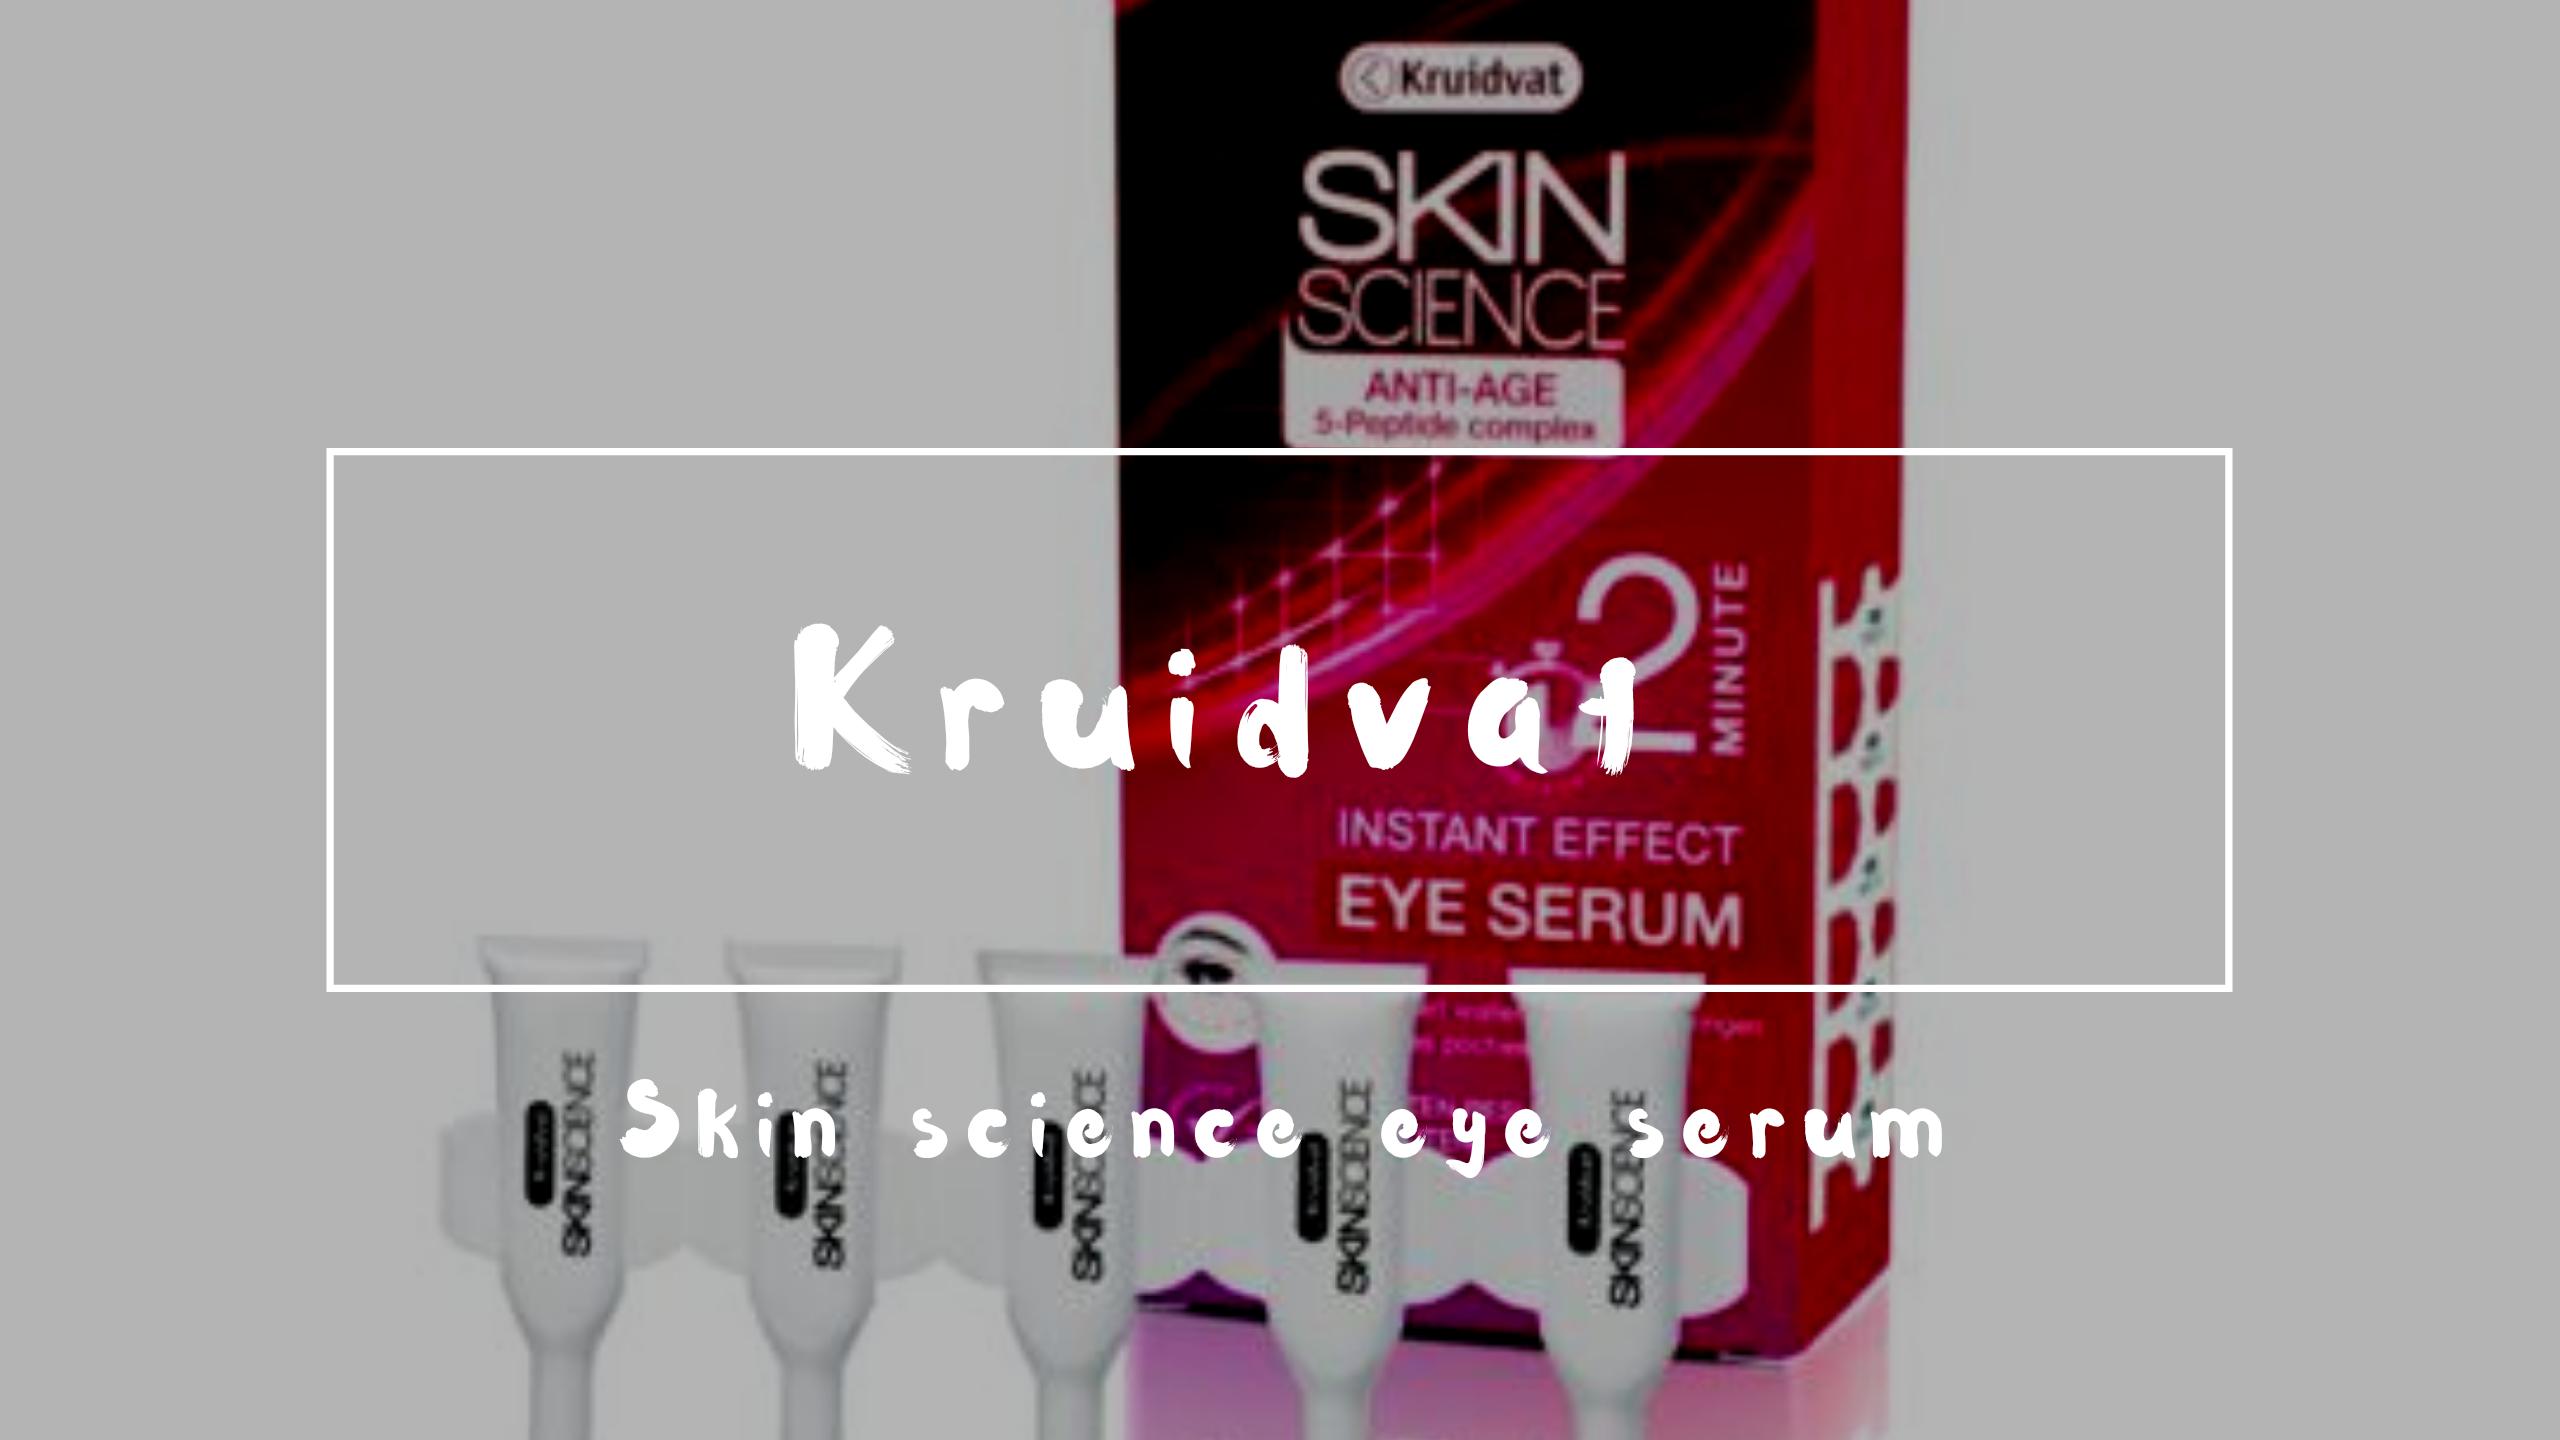 Skin science eye serum by kruidvat